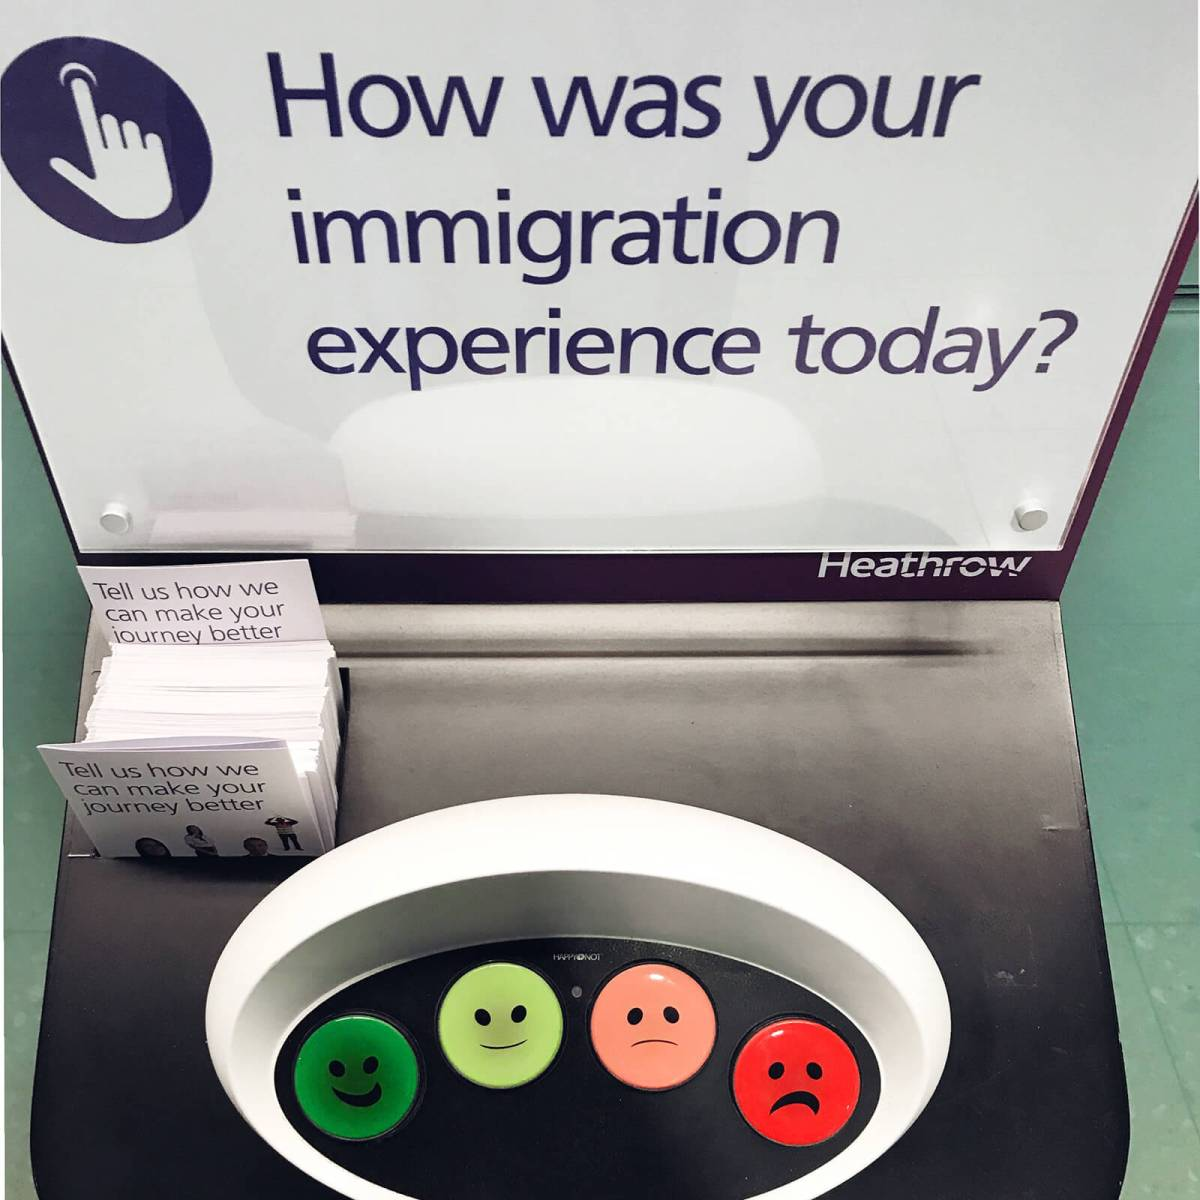 London Heathrow Airport immigration survey